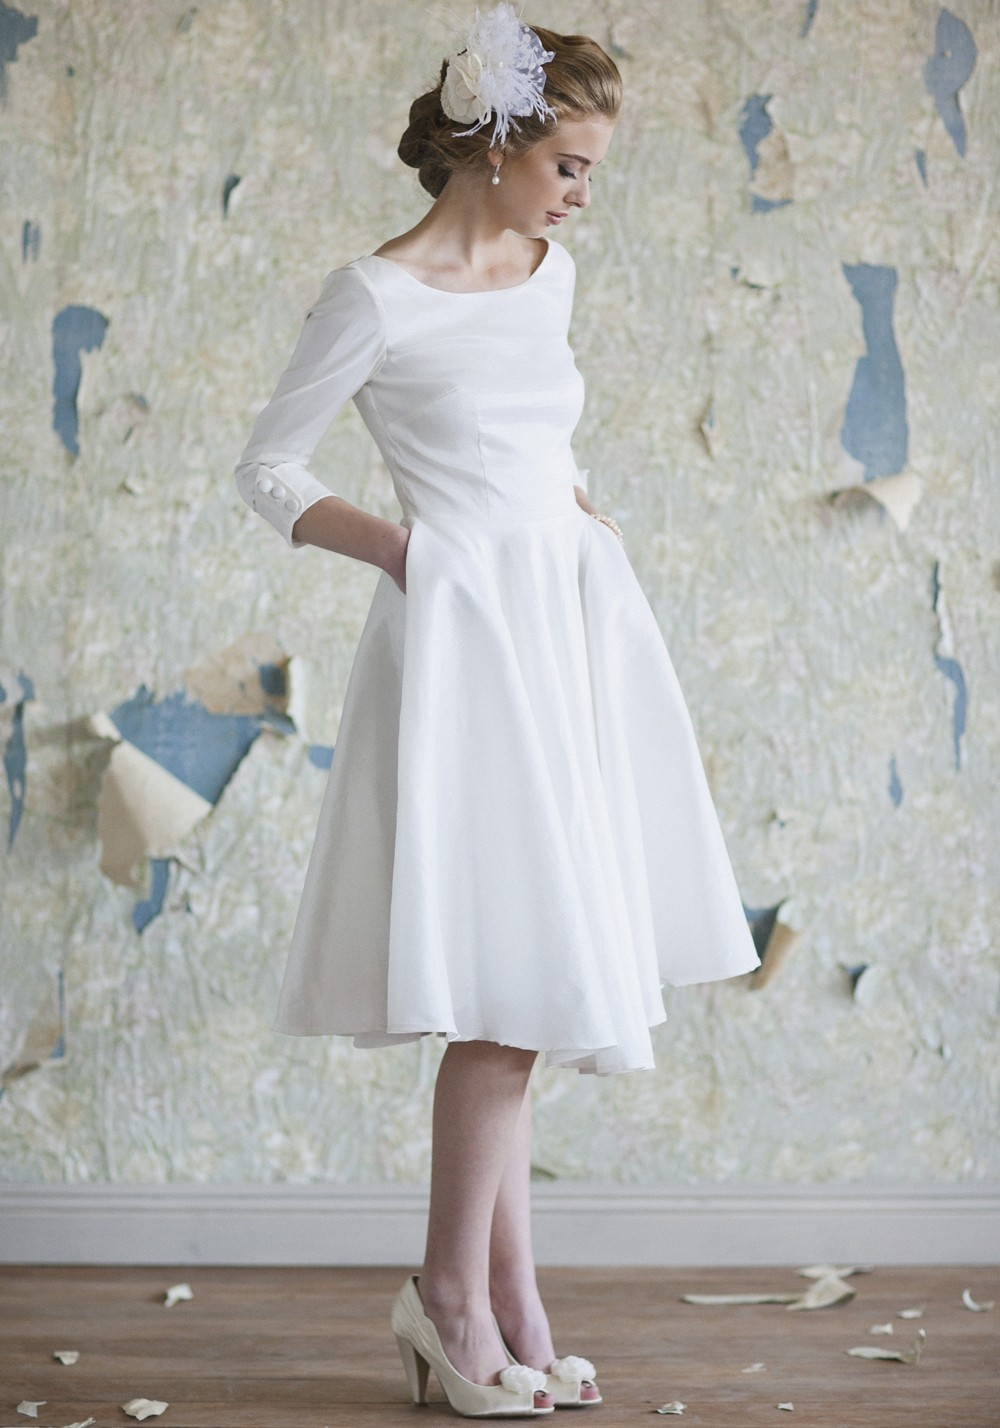 Simple White Short Knee Length Pockets Satin Wedding Bridal Dress ...